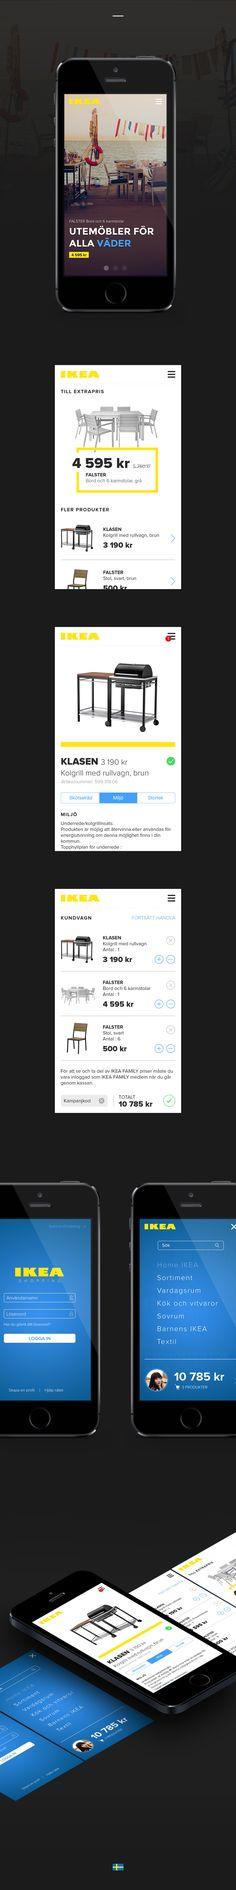 IKEA Mobile App Redesign Concept